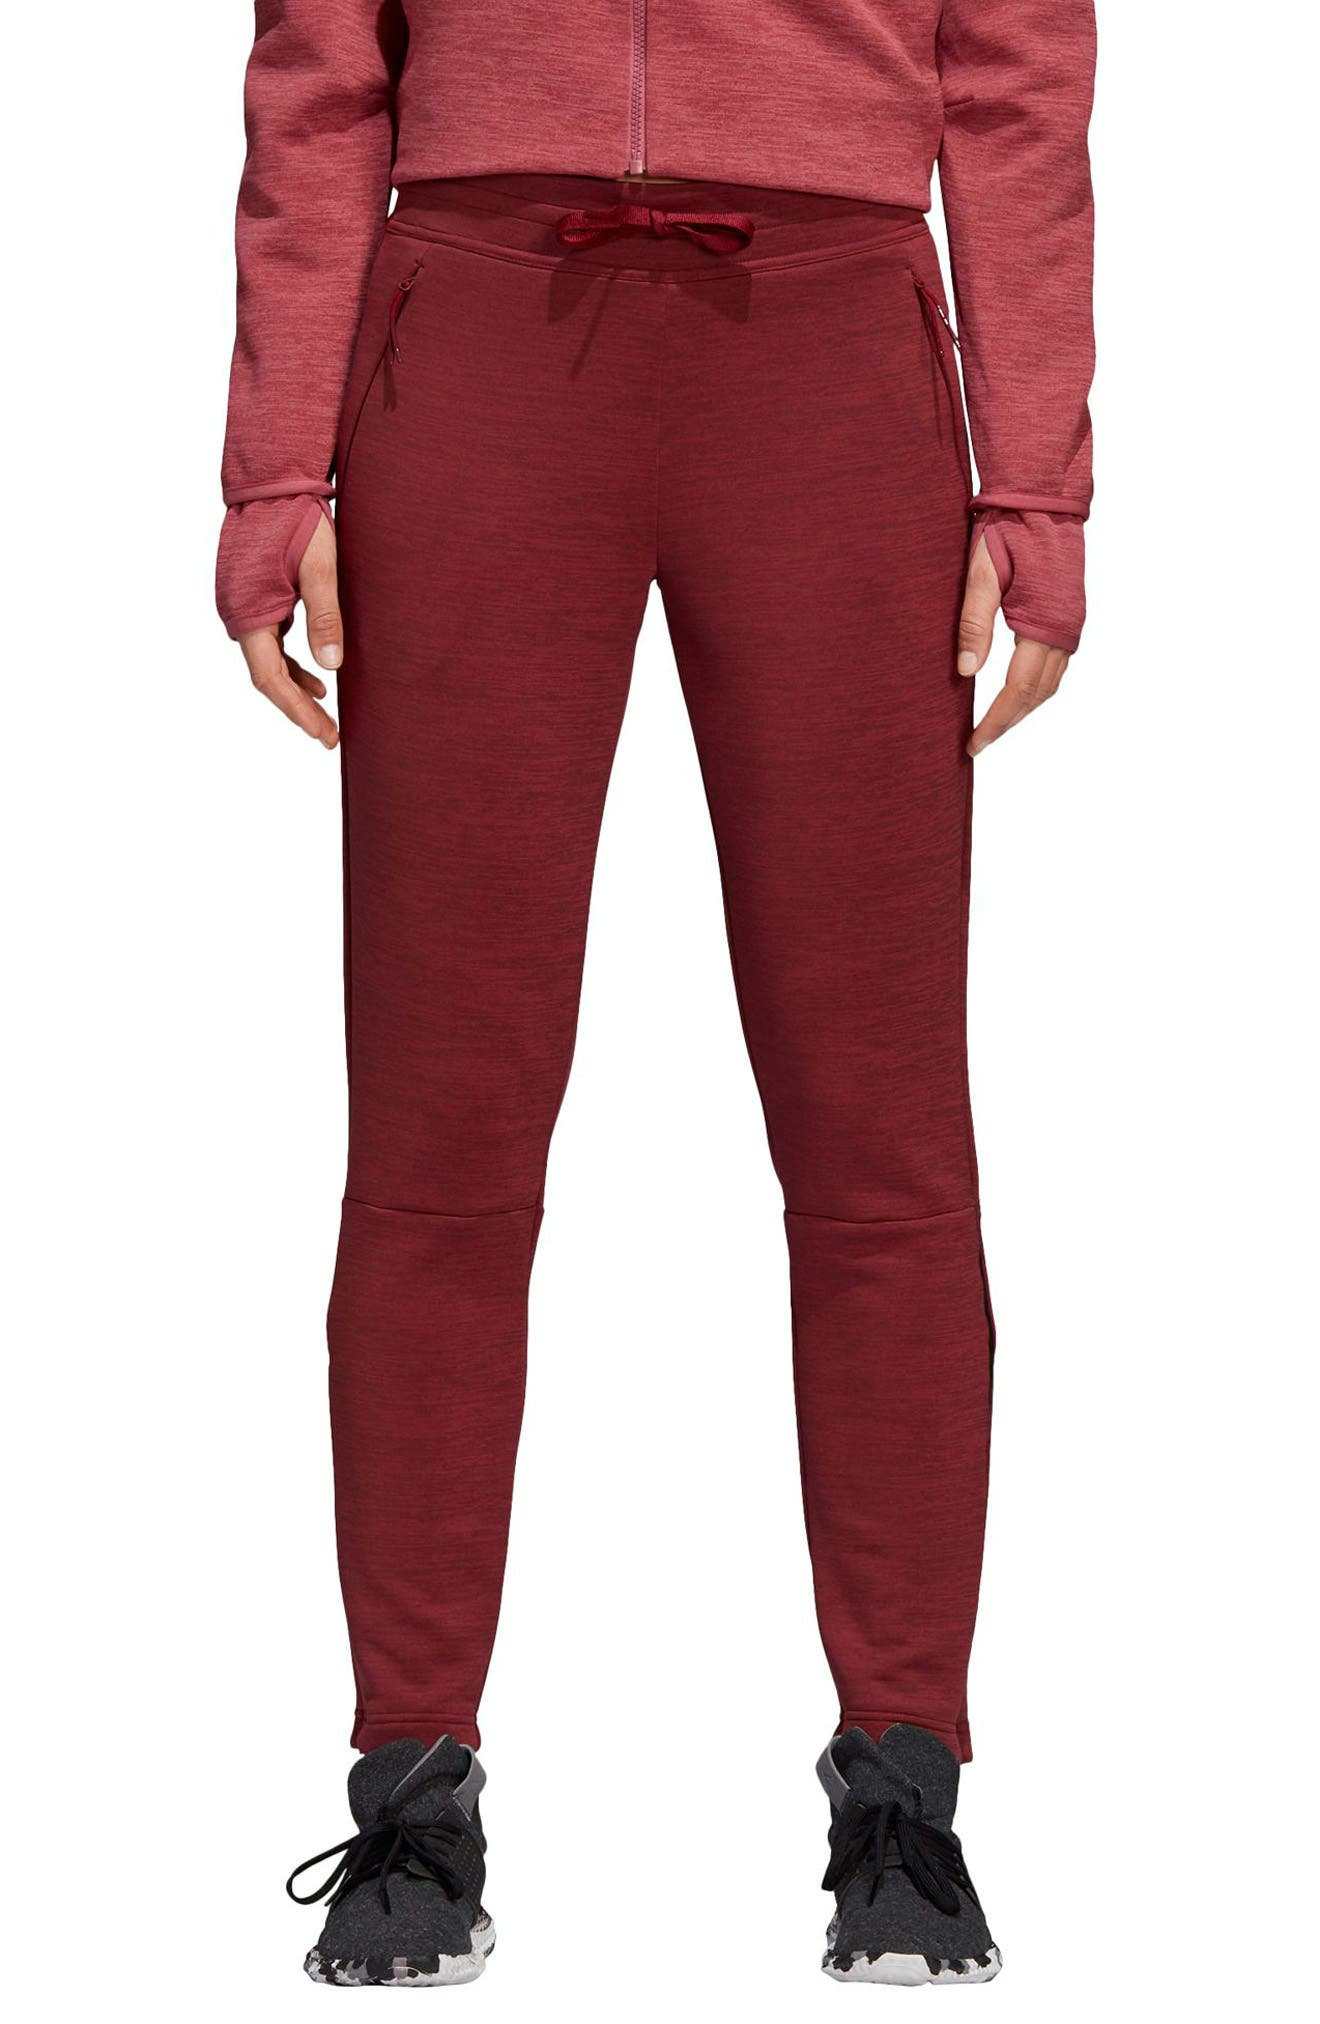 ADIDAS Z.N.E Pants, Main, color, 640